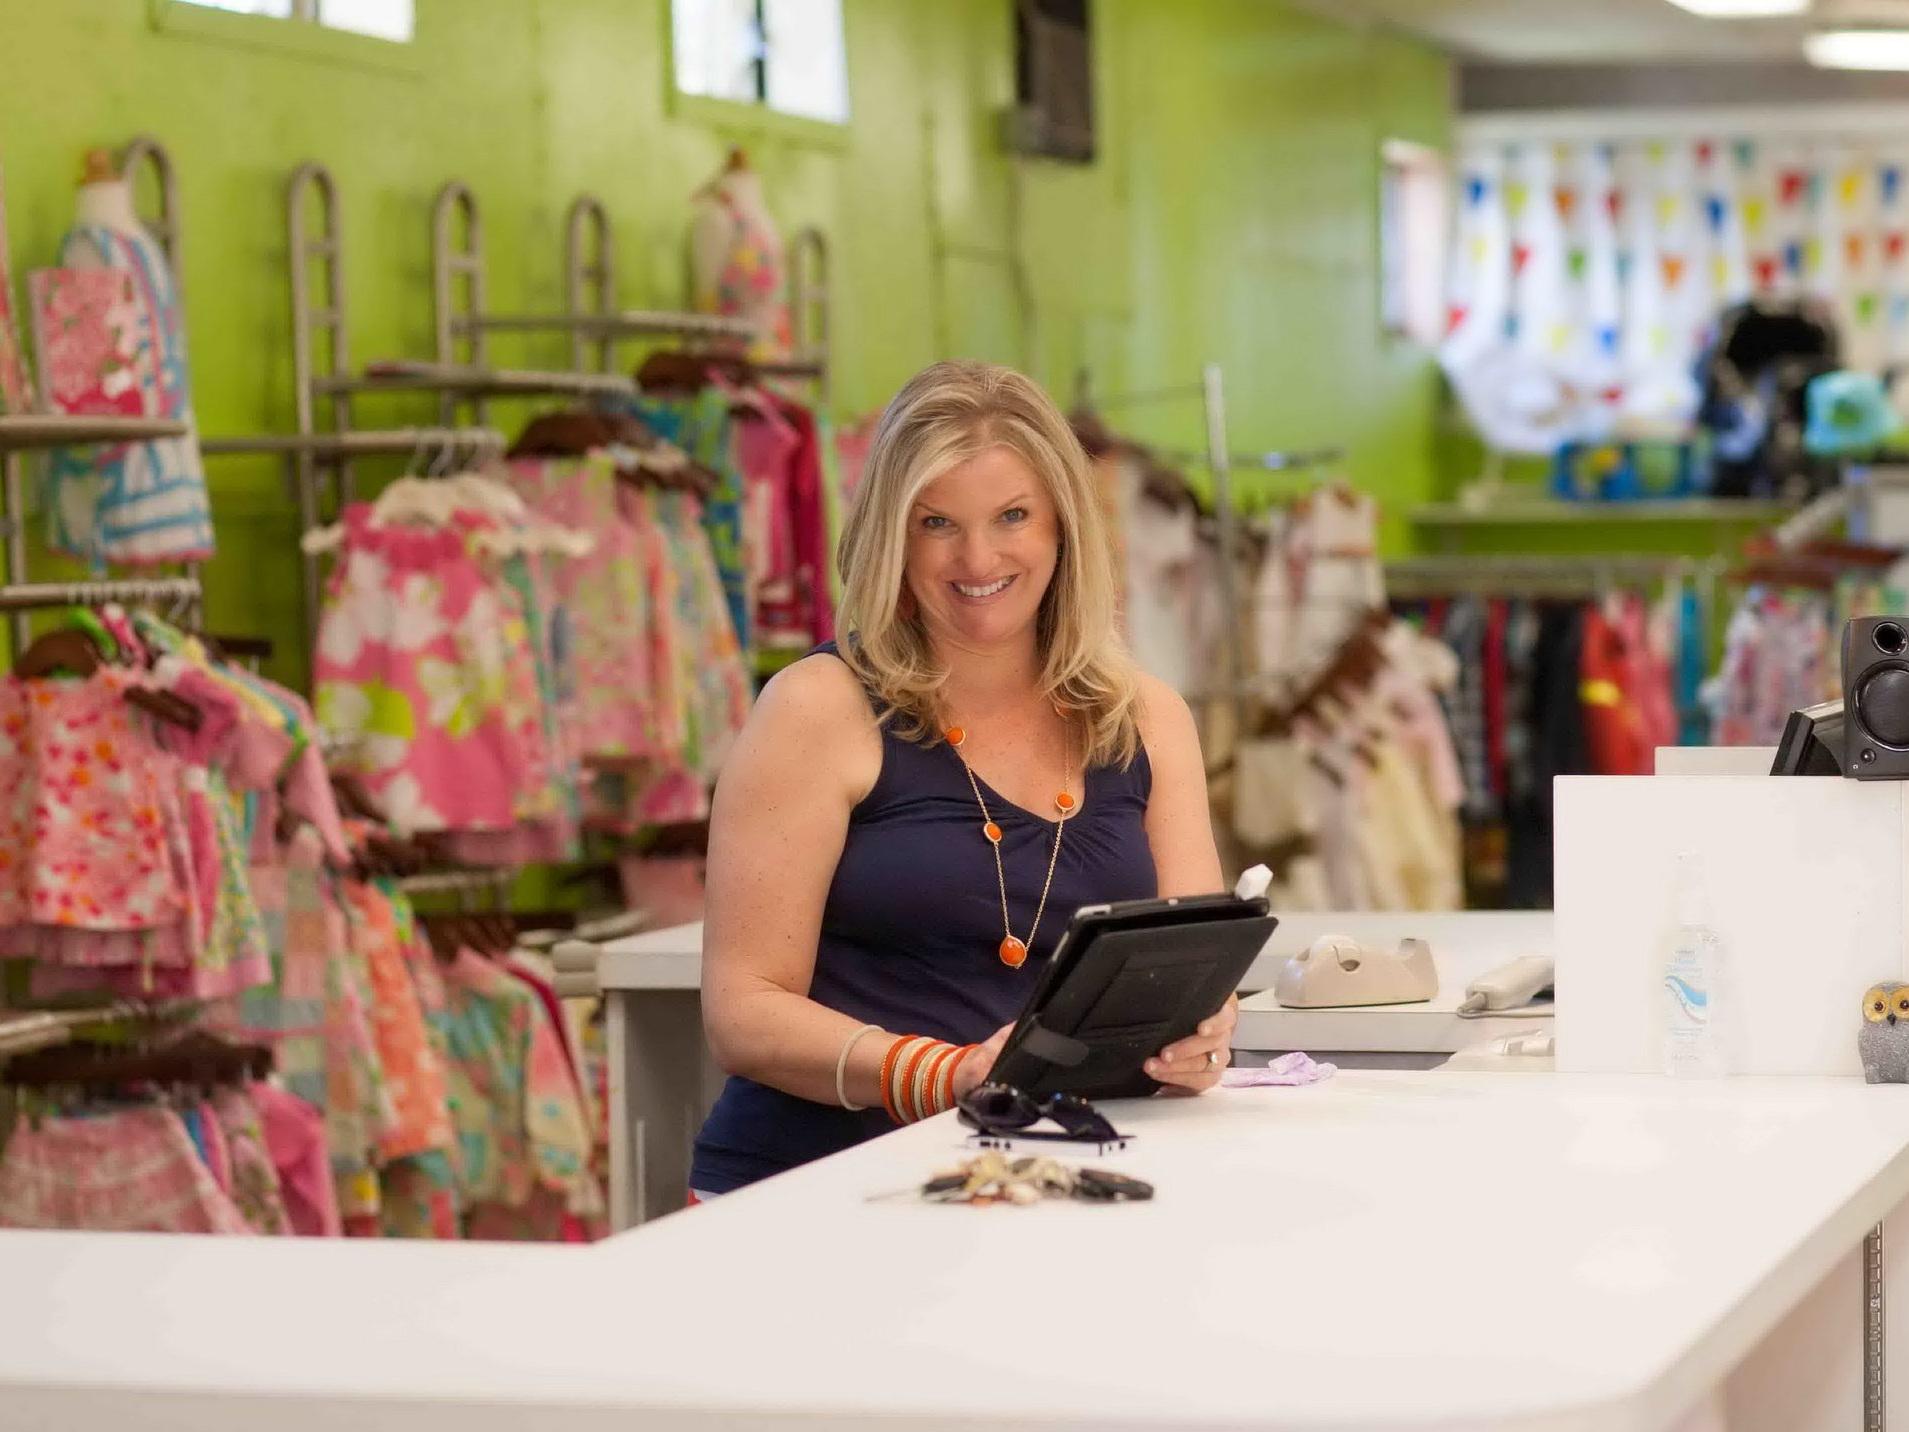 Luca Boutique Owner, Diane Jennings